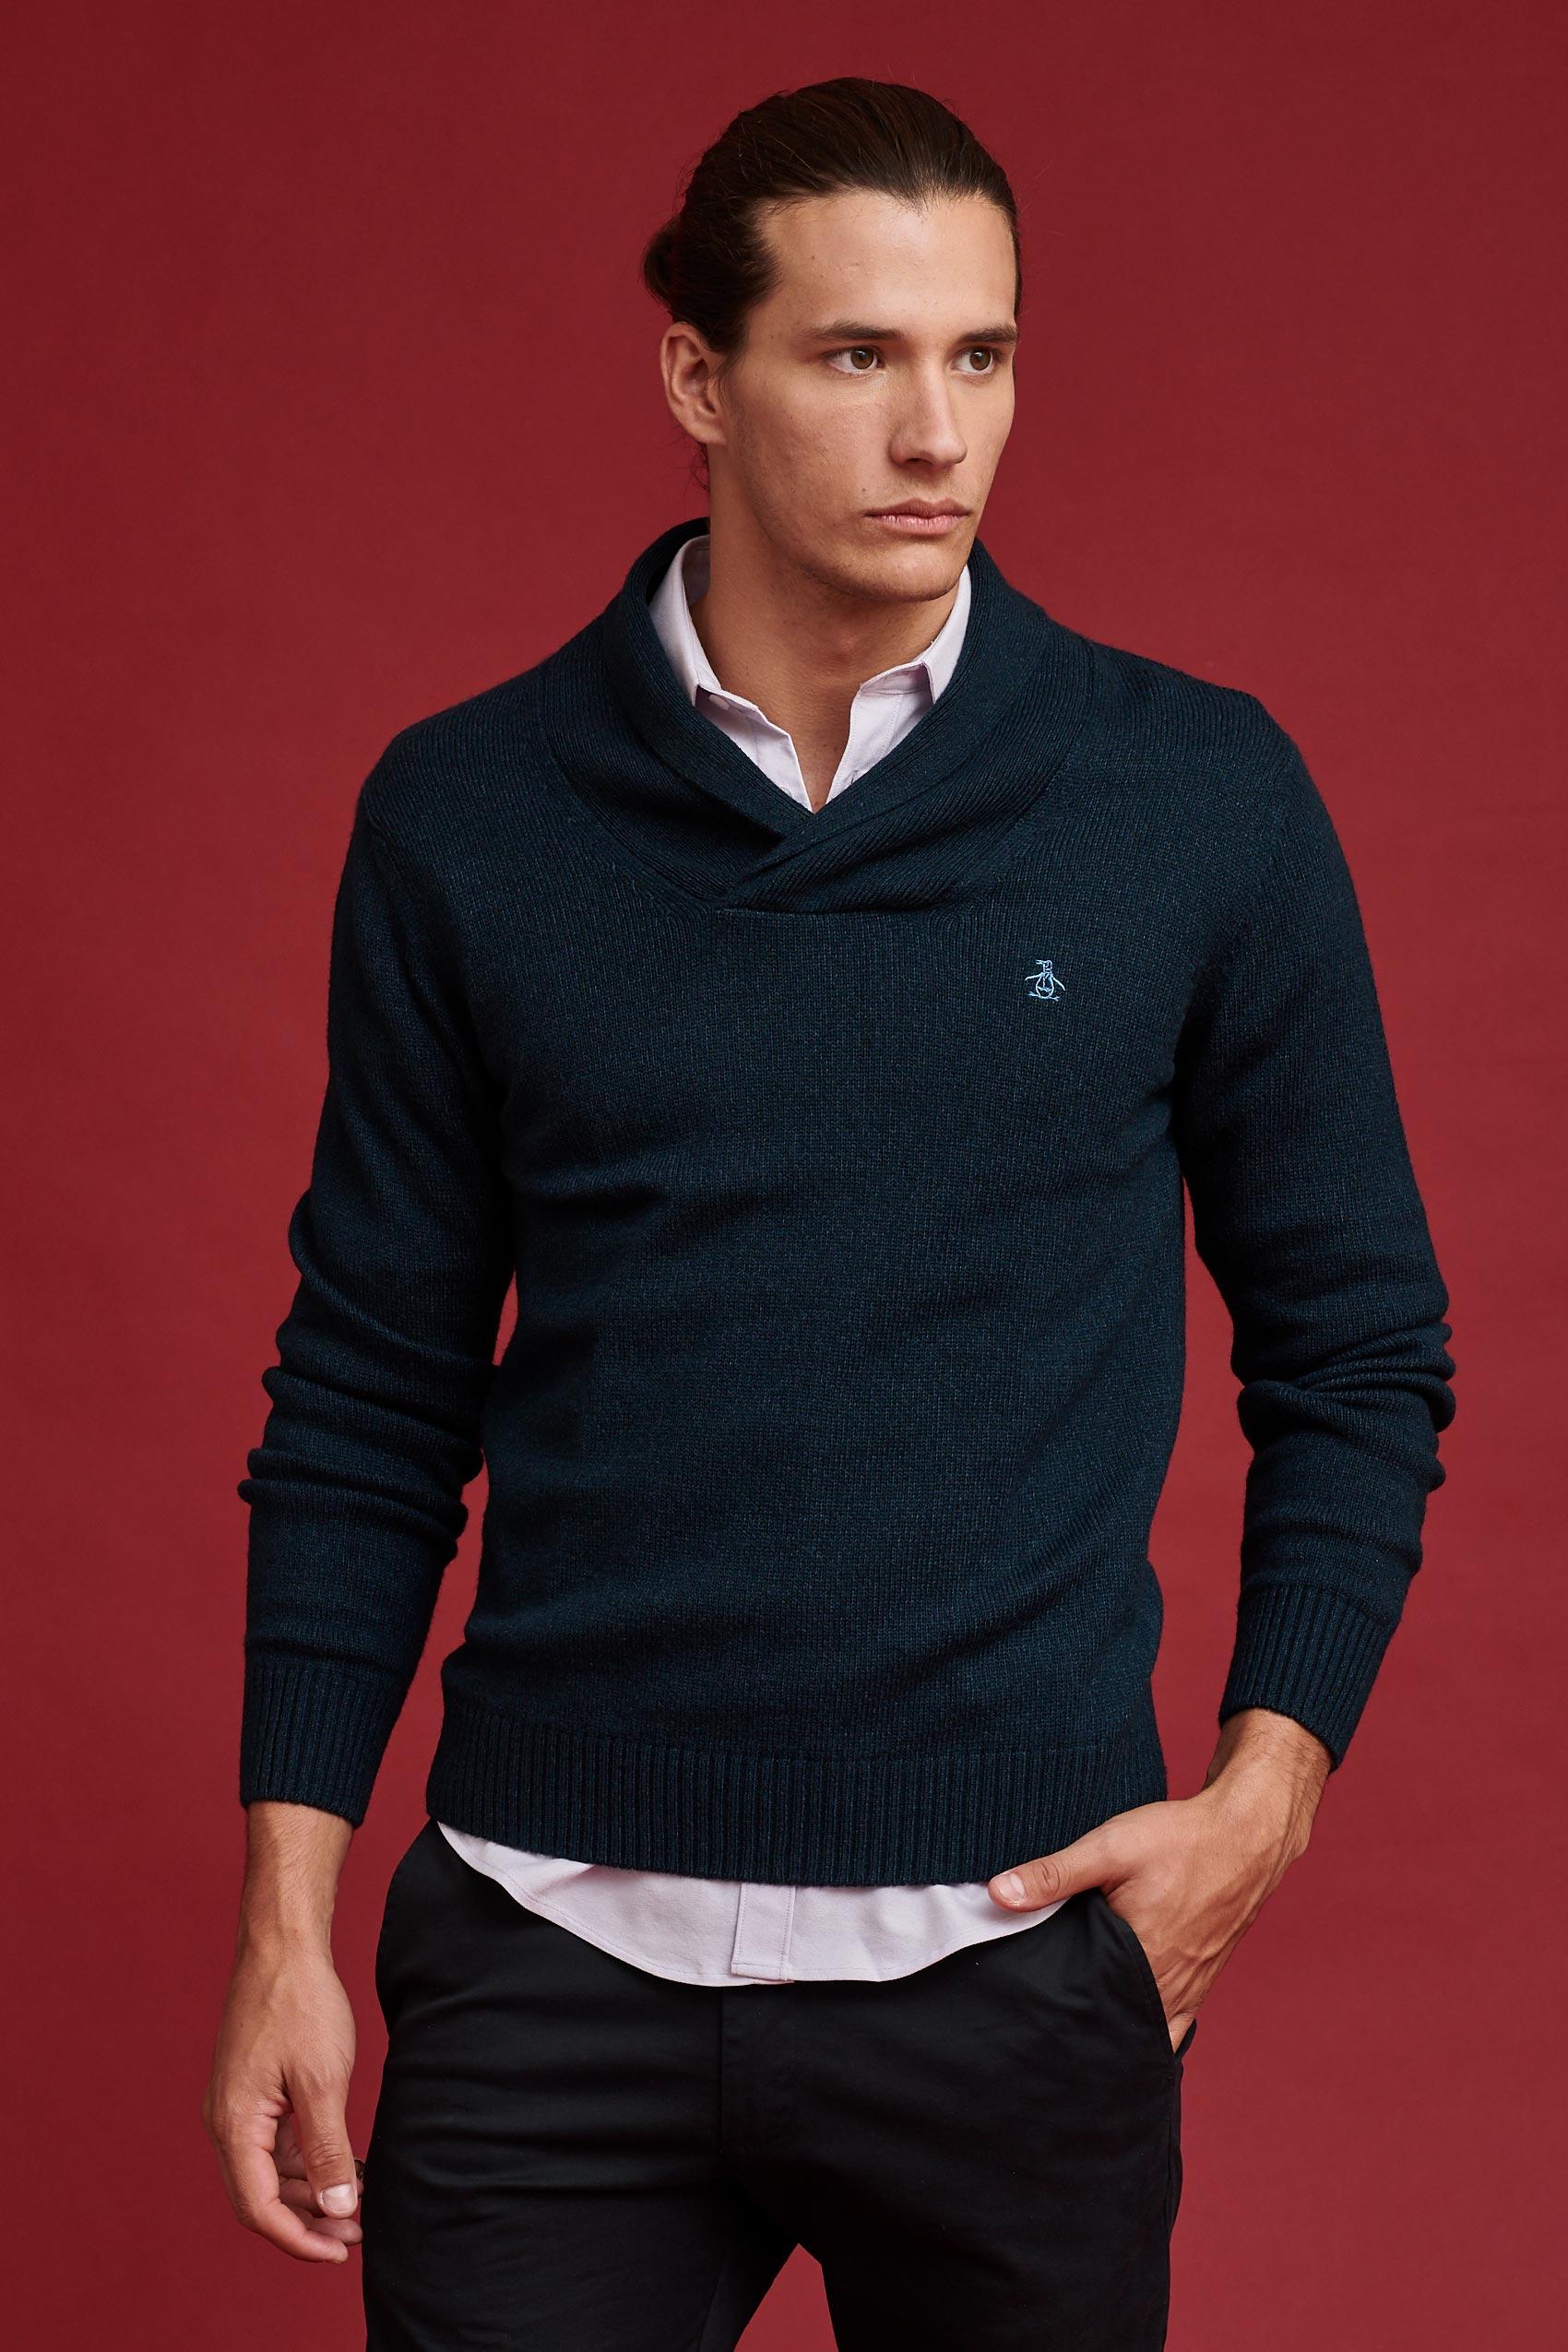 penguin_shawl-collar-sweater_00-14-2020__picture-14750